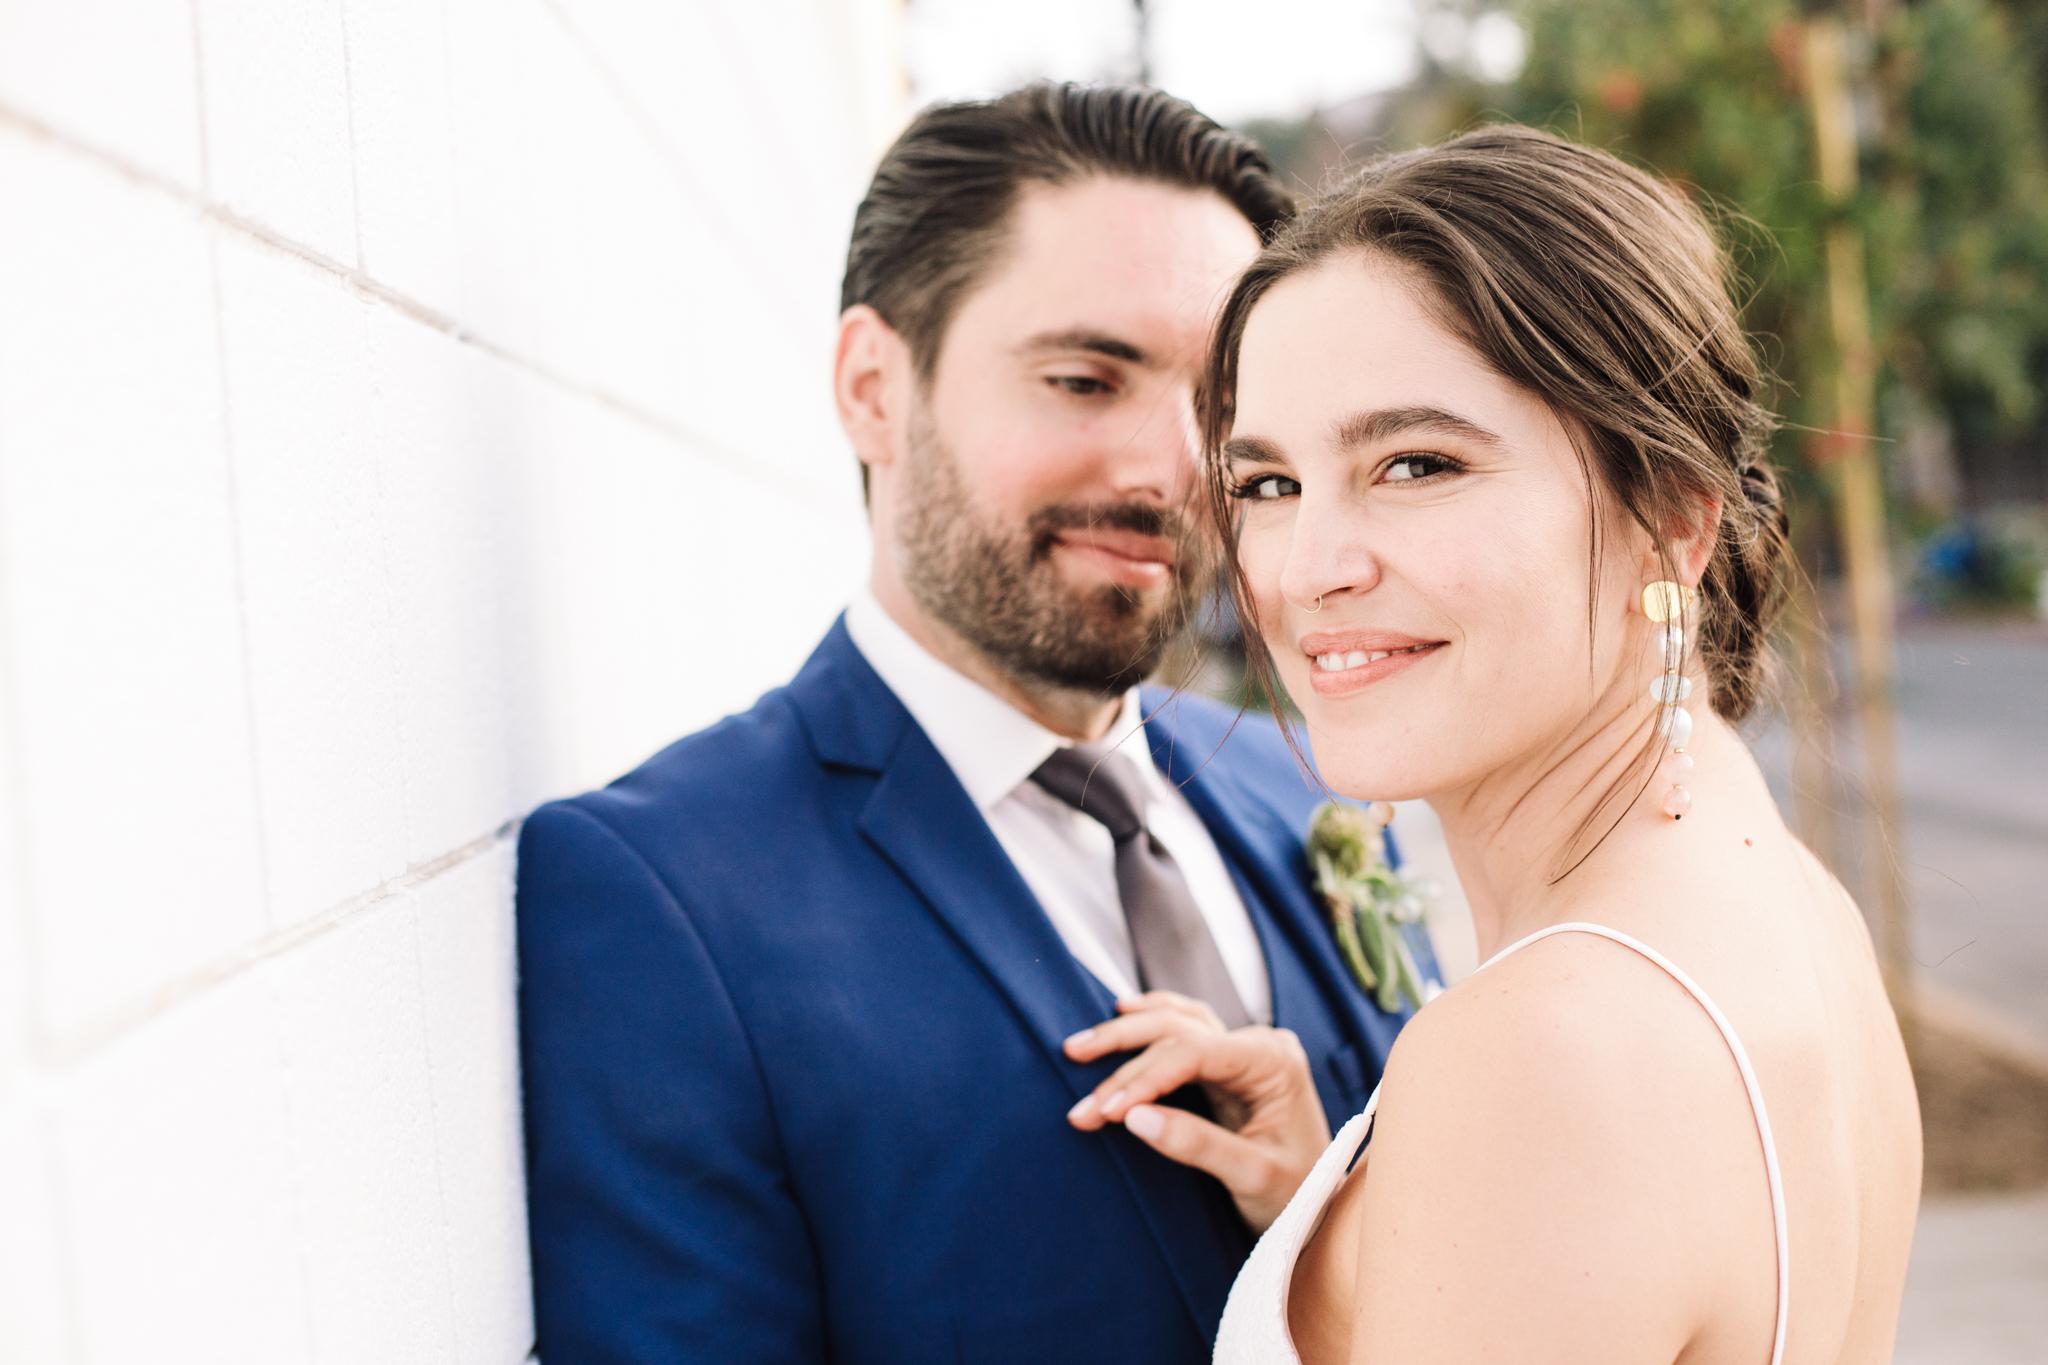 Modern Chic Minimalist wedding couple